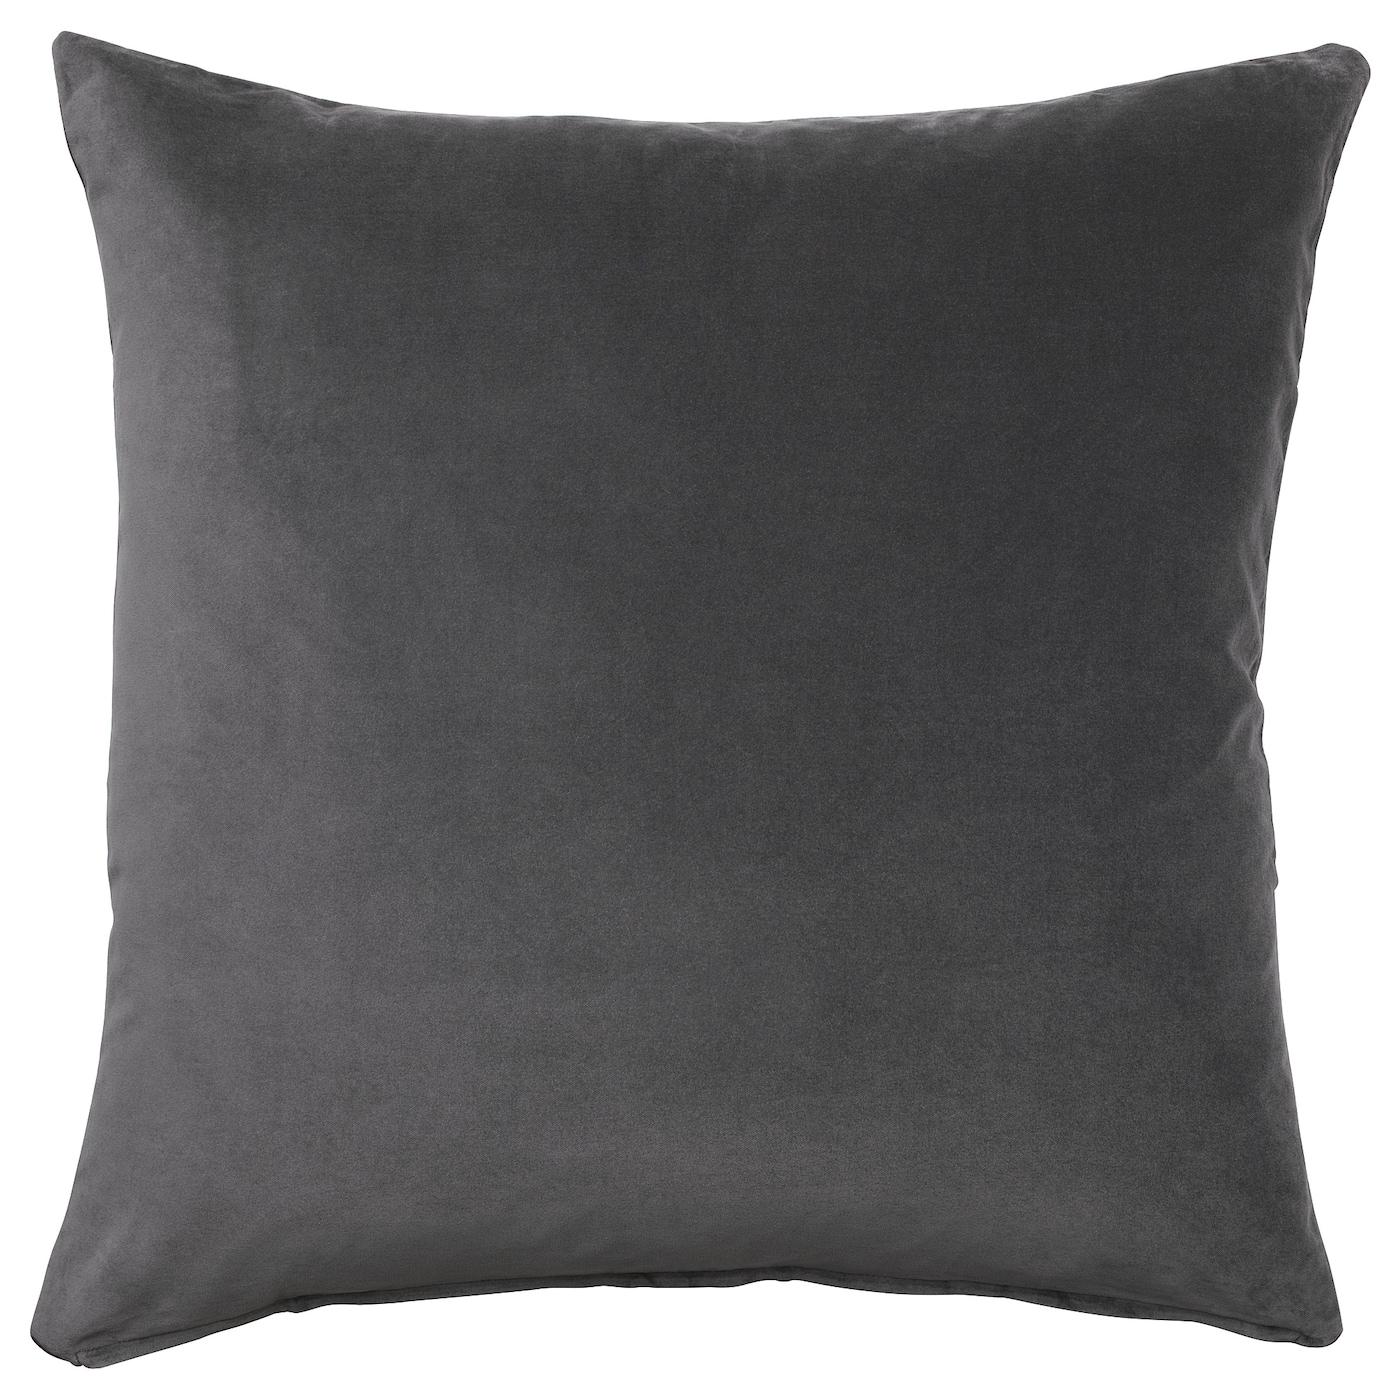 IKEA AINA Cushion cover  Grey  50 x 50 cm  UK-B786